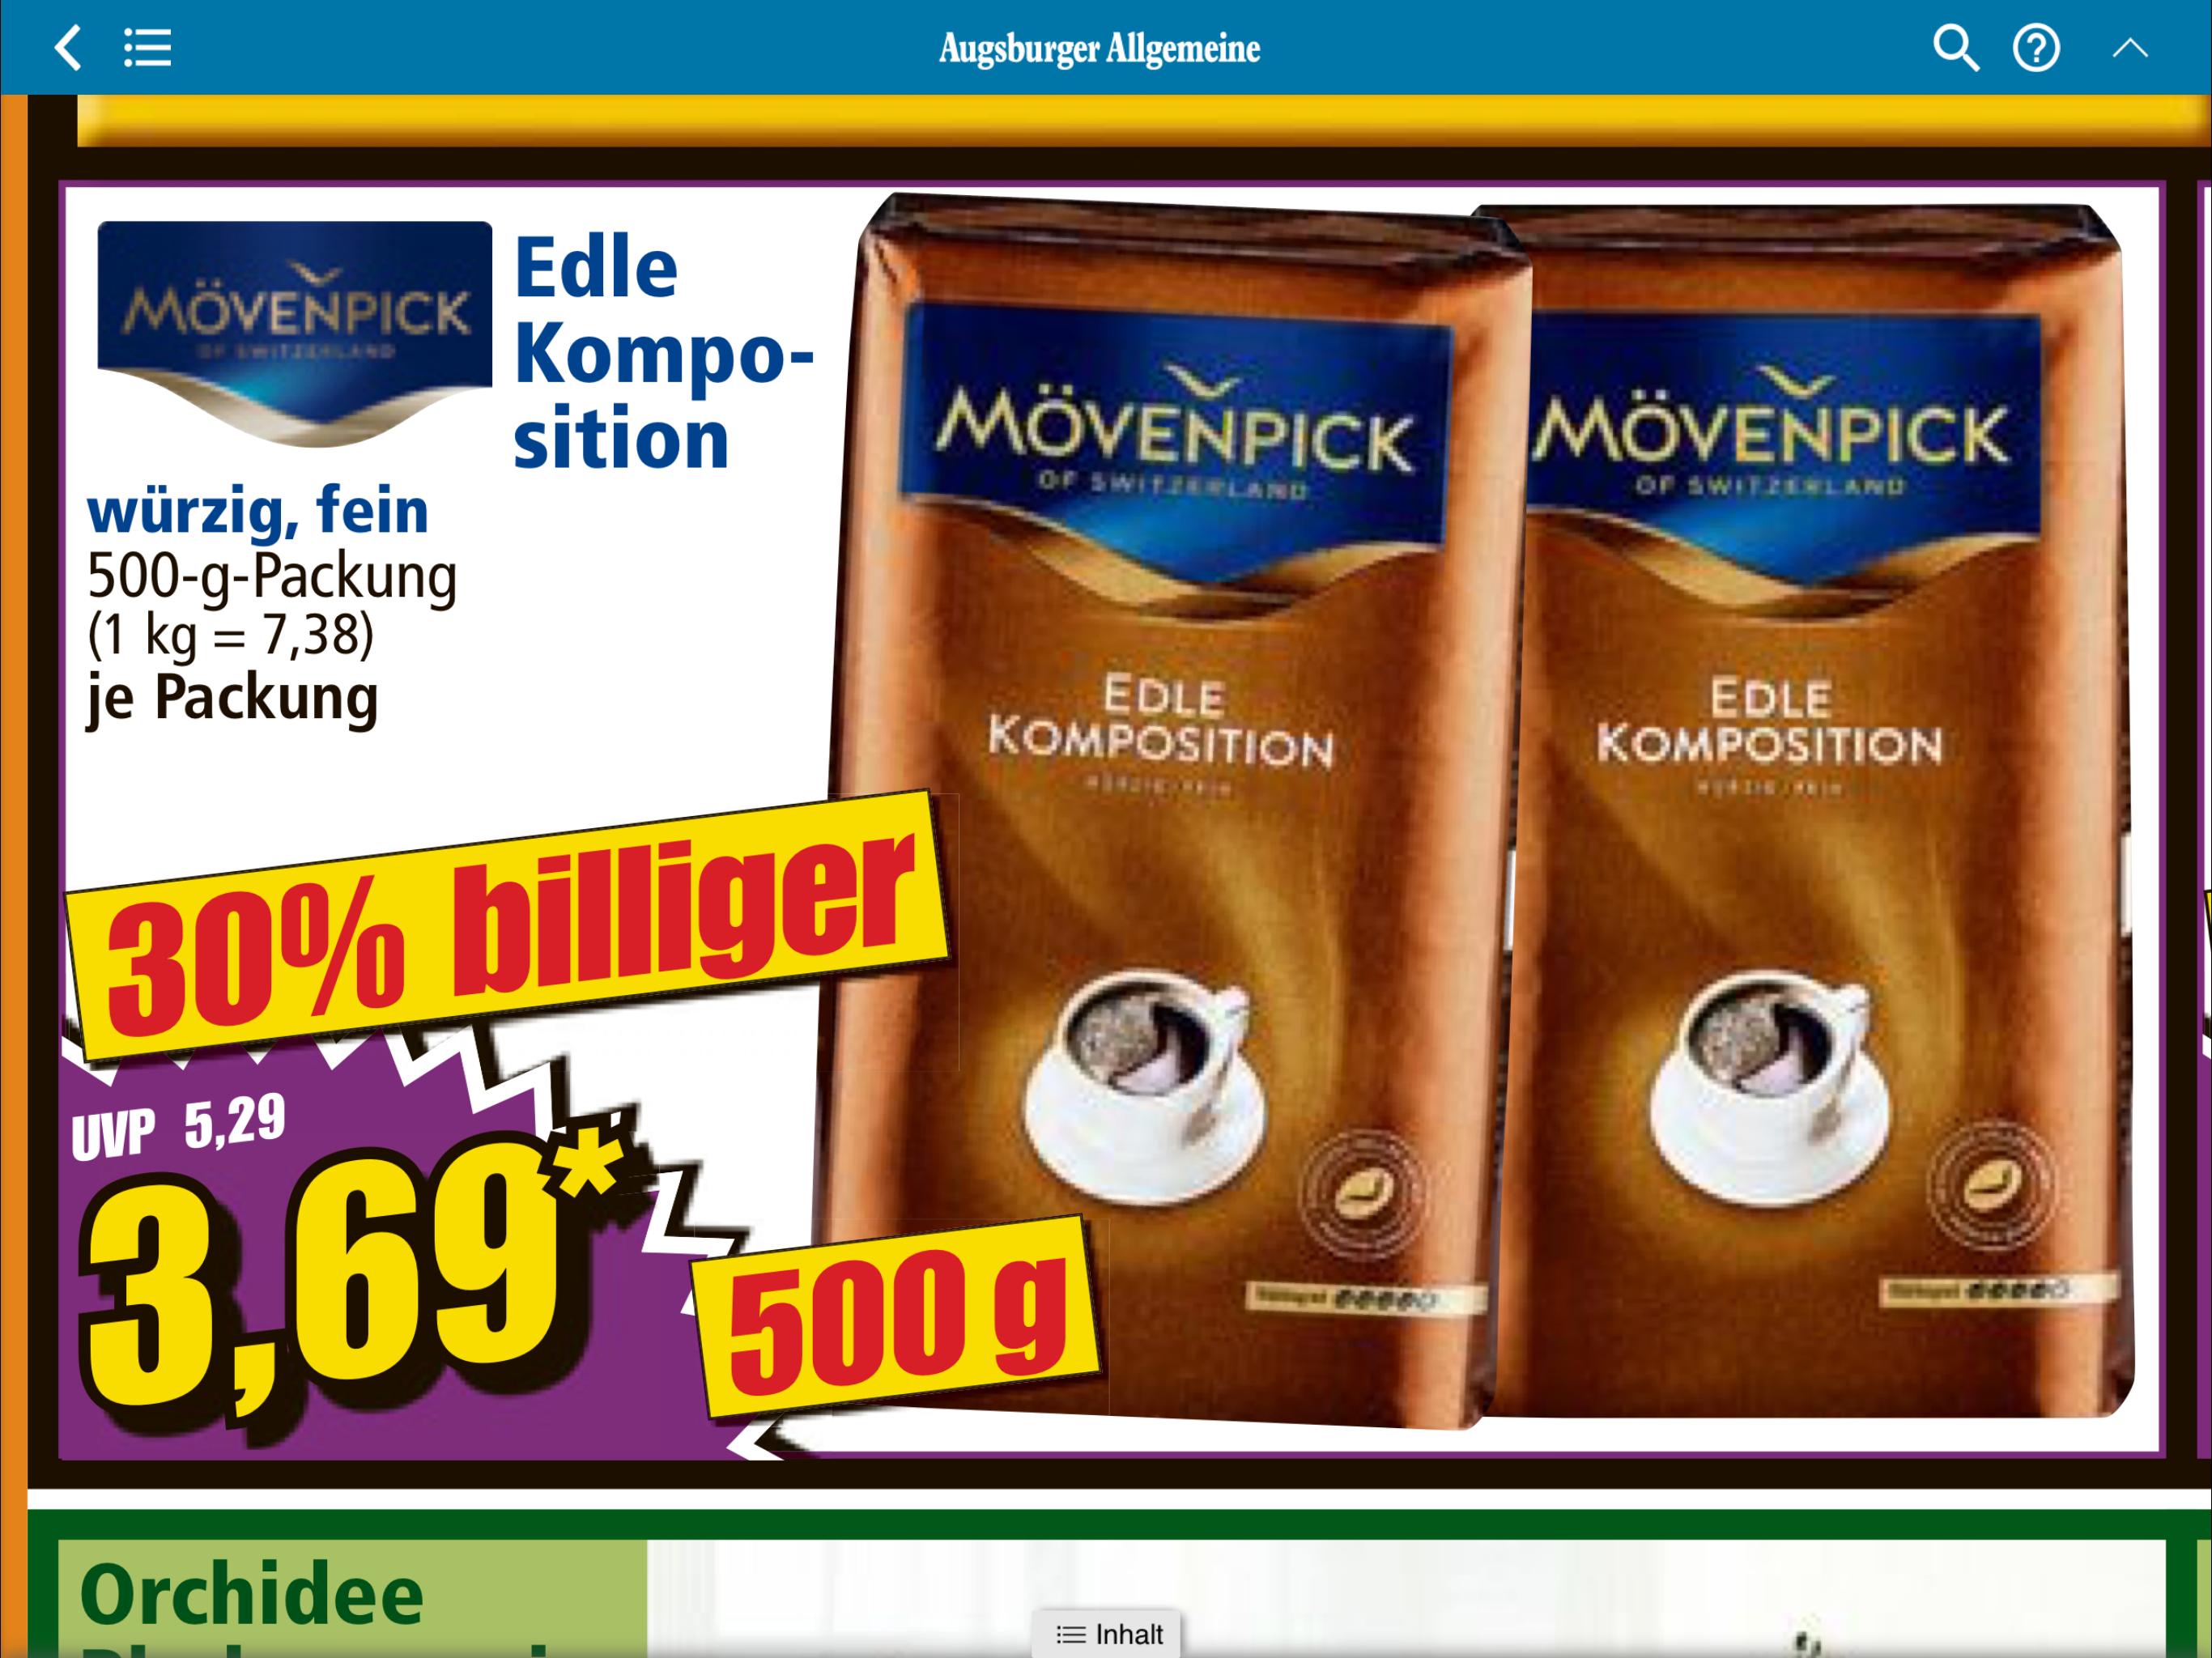 Offline Norma Mövenpick Edle Komposition 30% Billiger